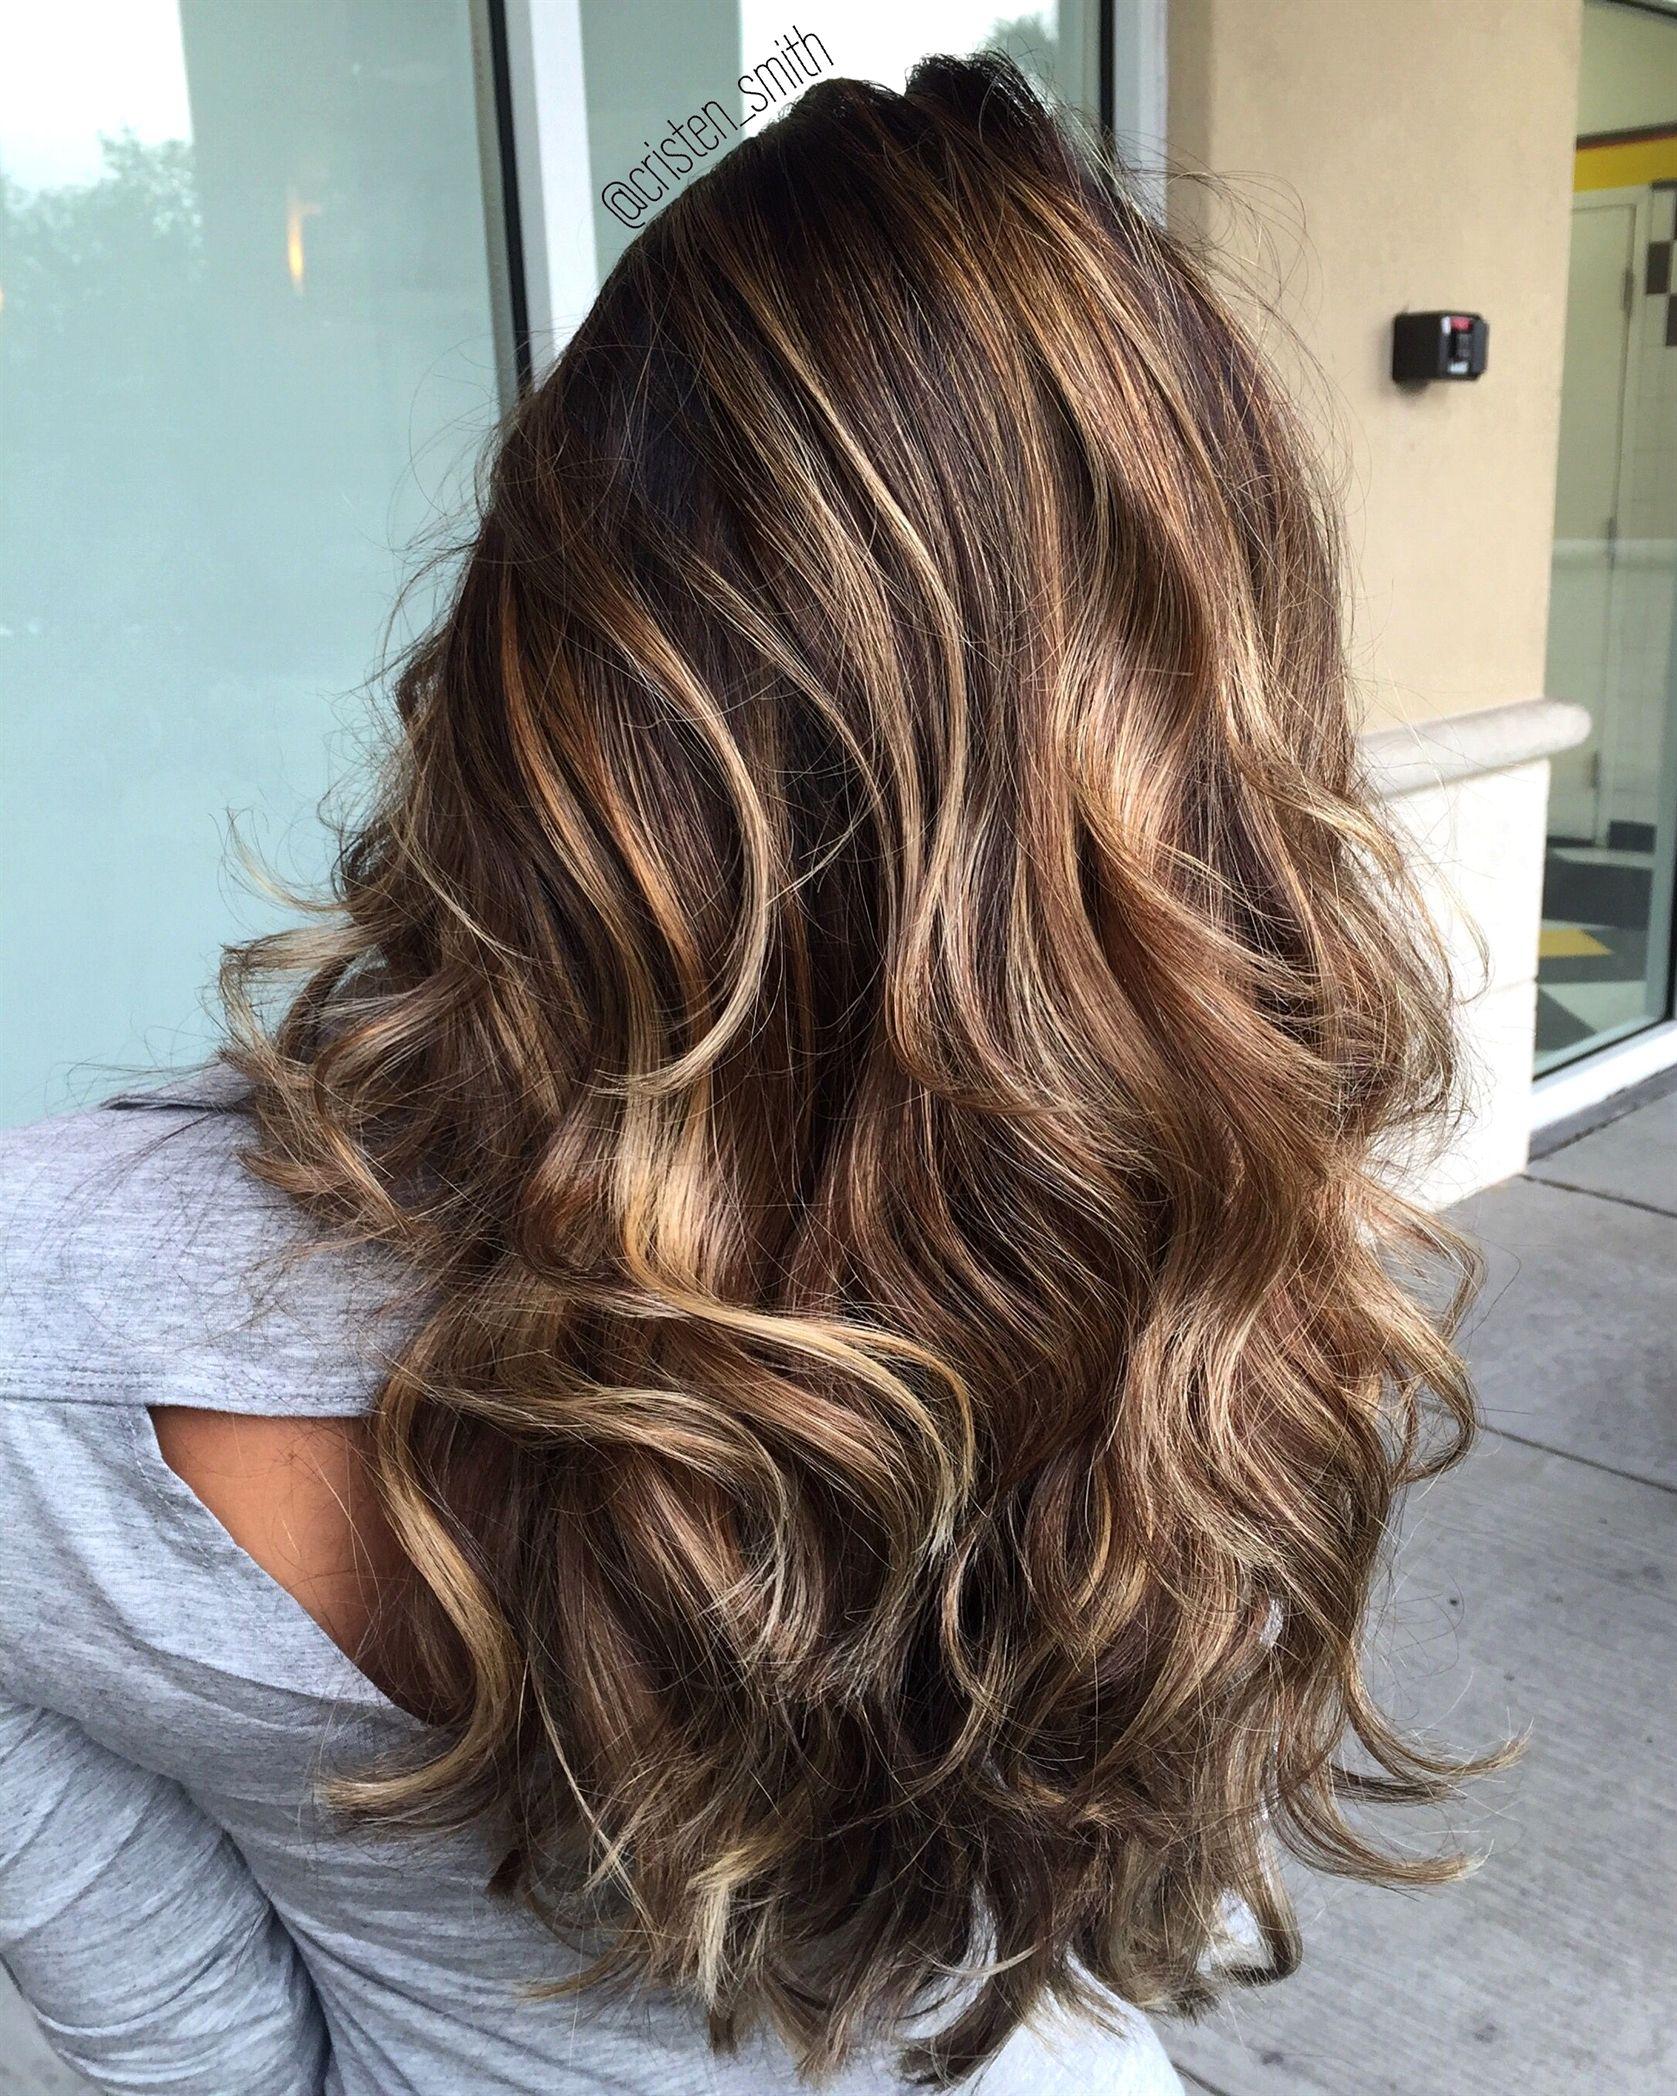 delightfully earthy fall hair color ideas ombrehaircolor oh my